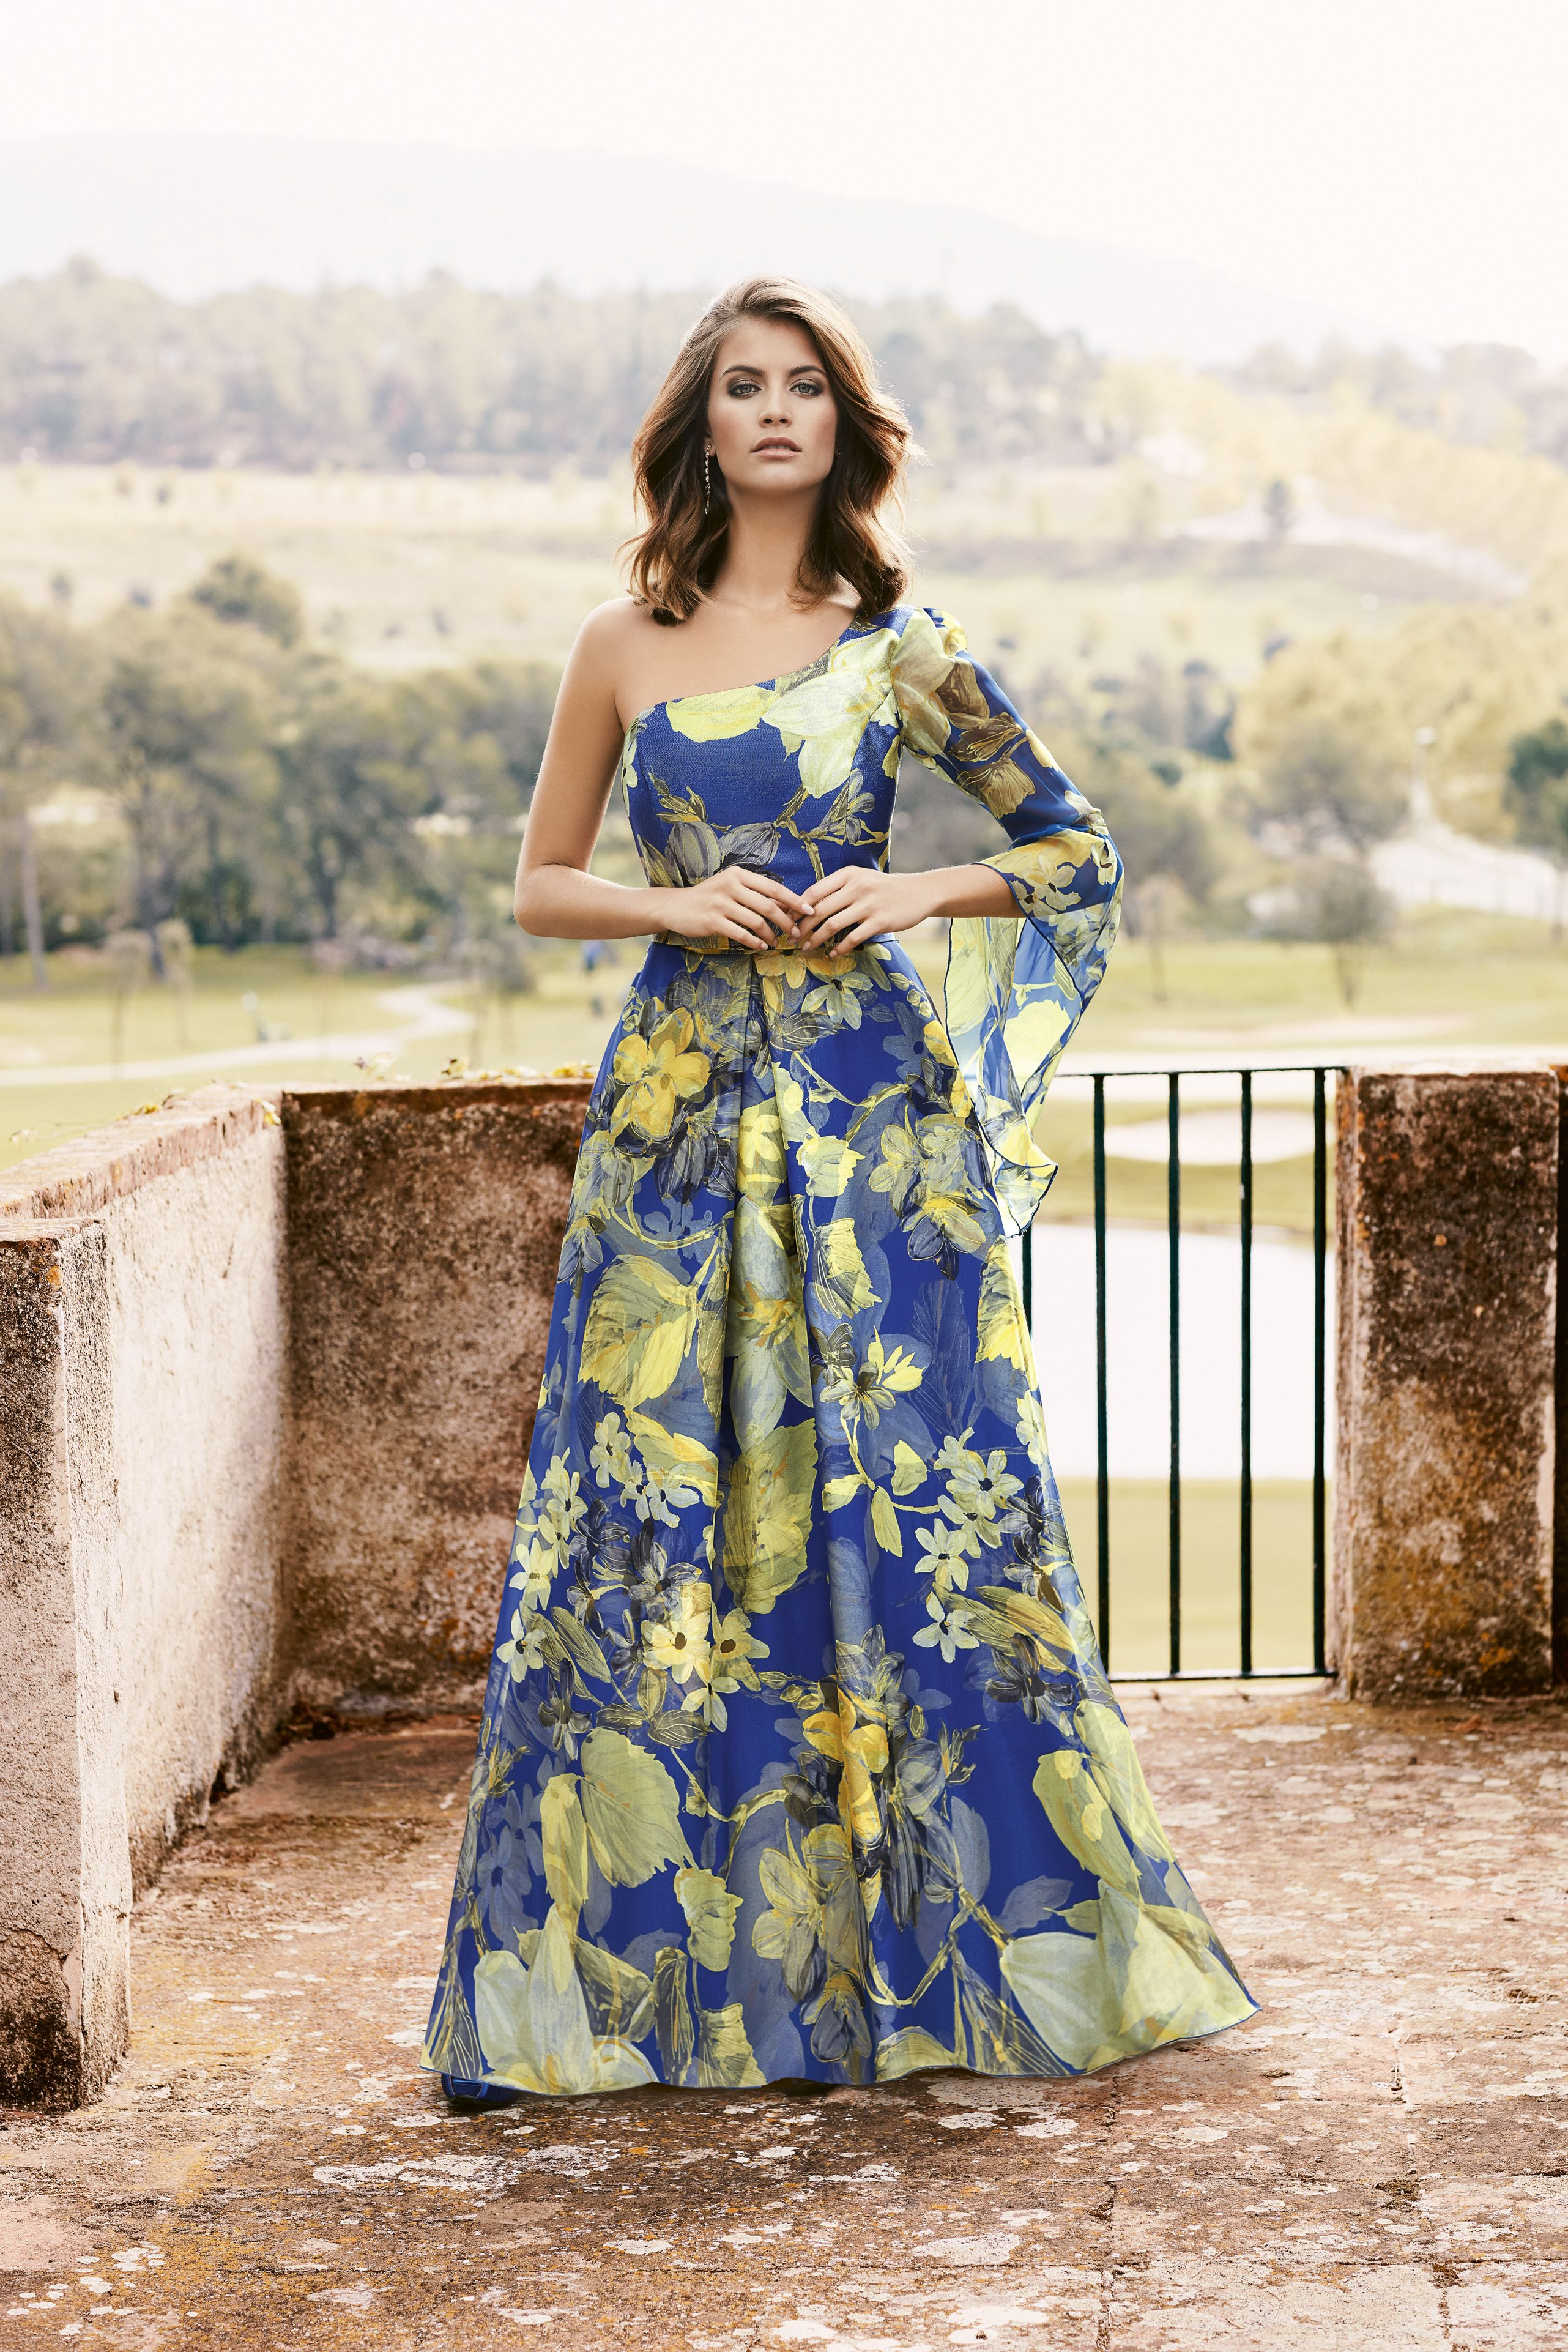 c8830c921 Nati Jimenez 2018 Modelo 746 Vestidos de madrina para este 2018 diferentes  . Vestido estampado de gasa